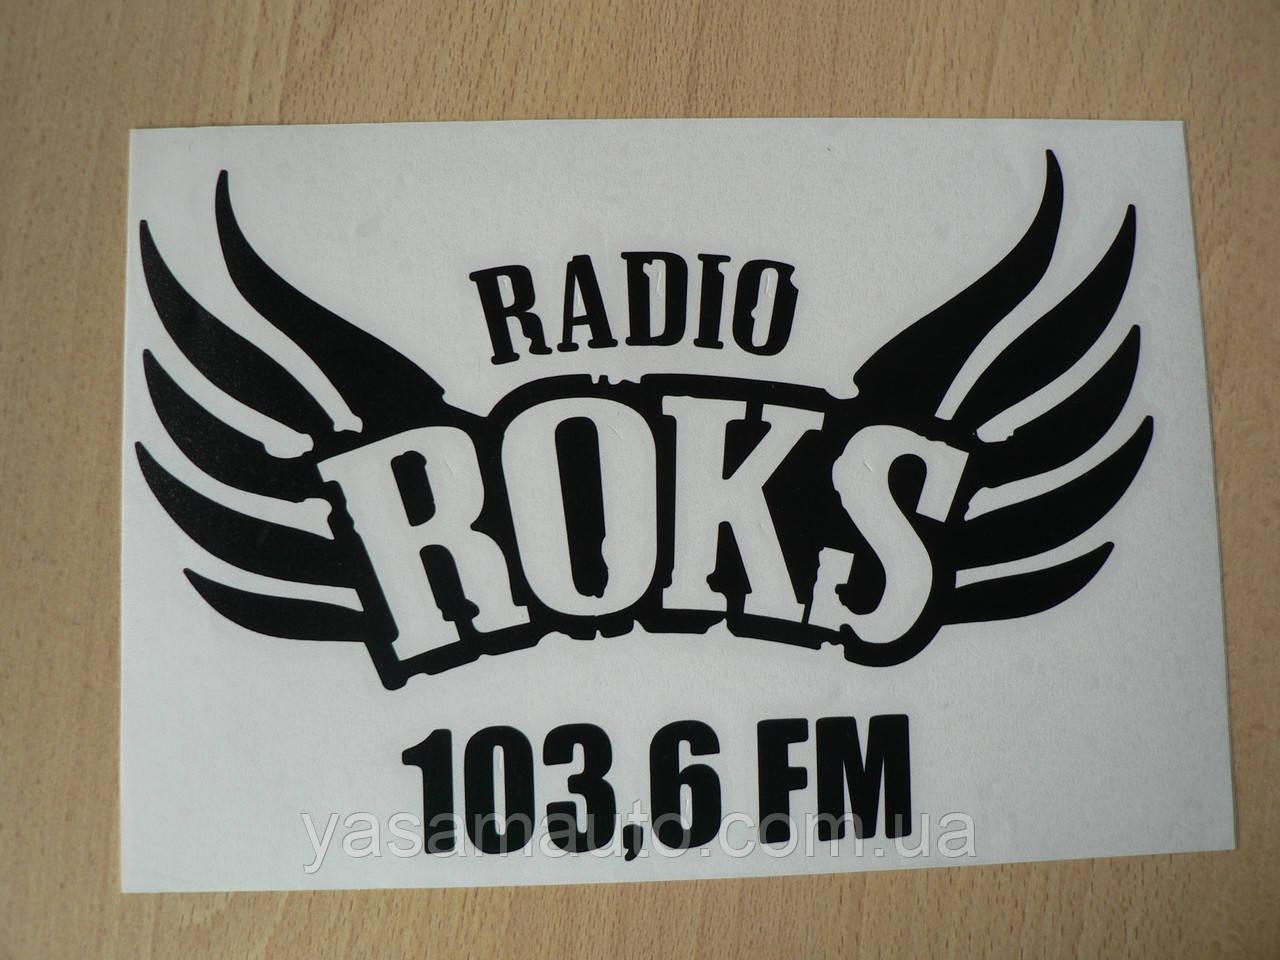 Наклейка vc музыка RADIO ROKS 103,6 FM черная 140х95мм Радио Рокс 103.6 ФМ виниловая контурная на авто